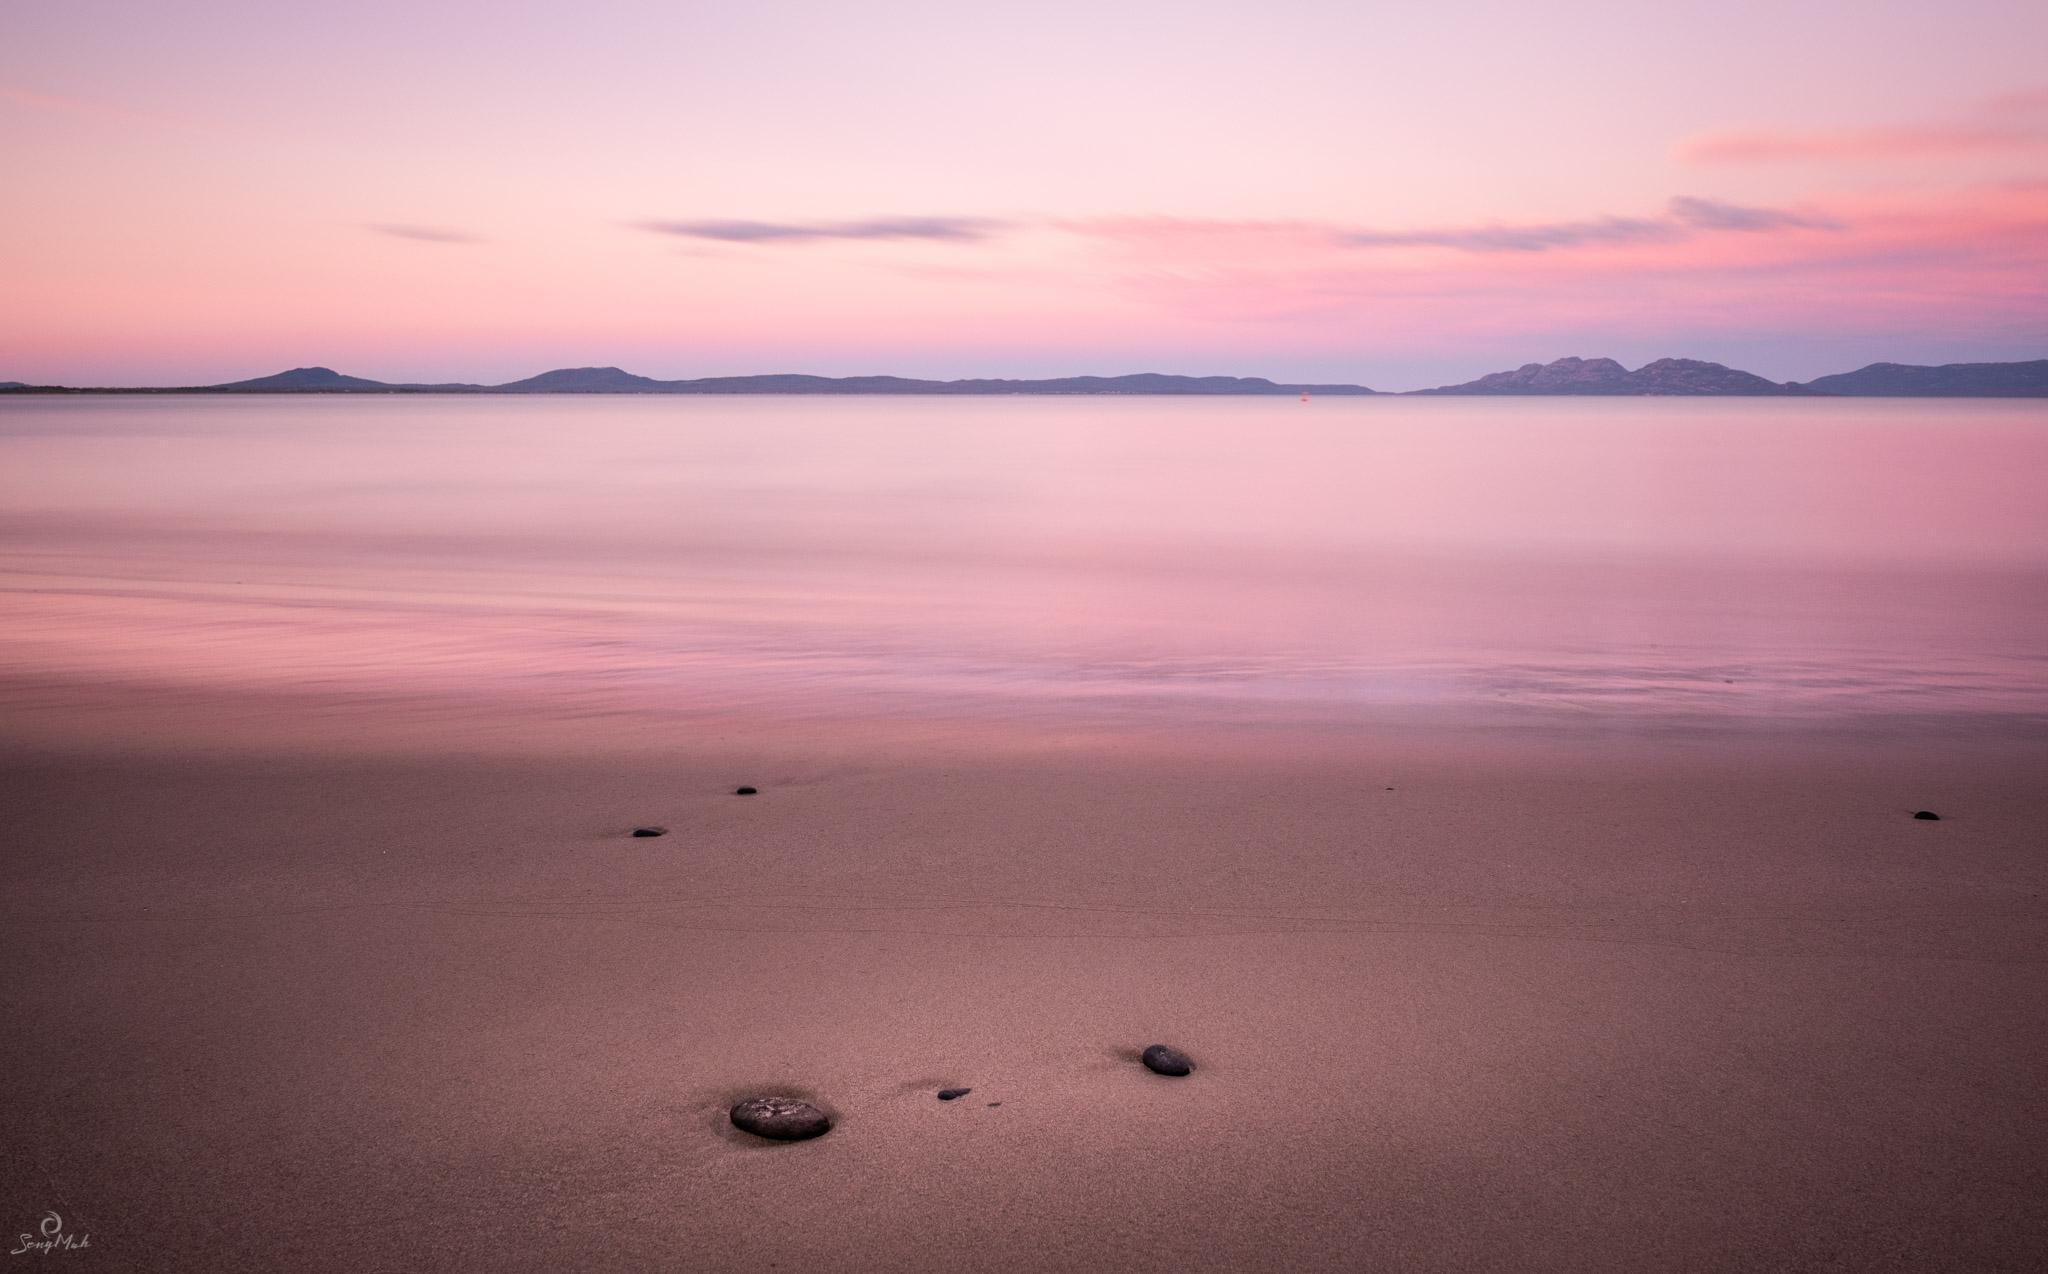 Freycinet Peninsula with Hazards